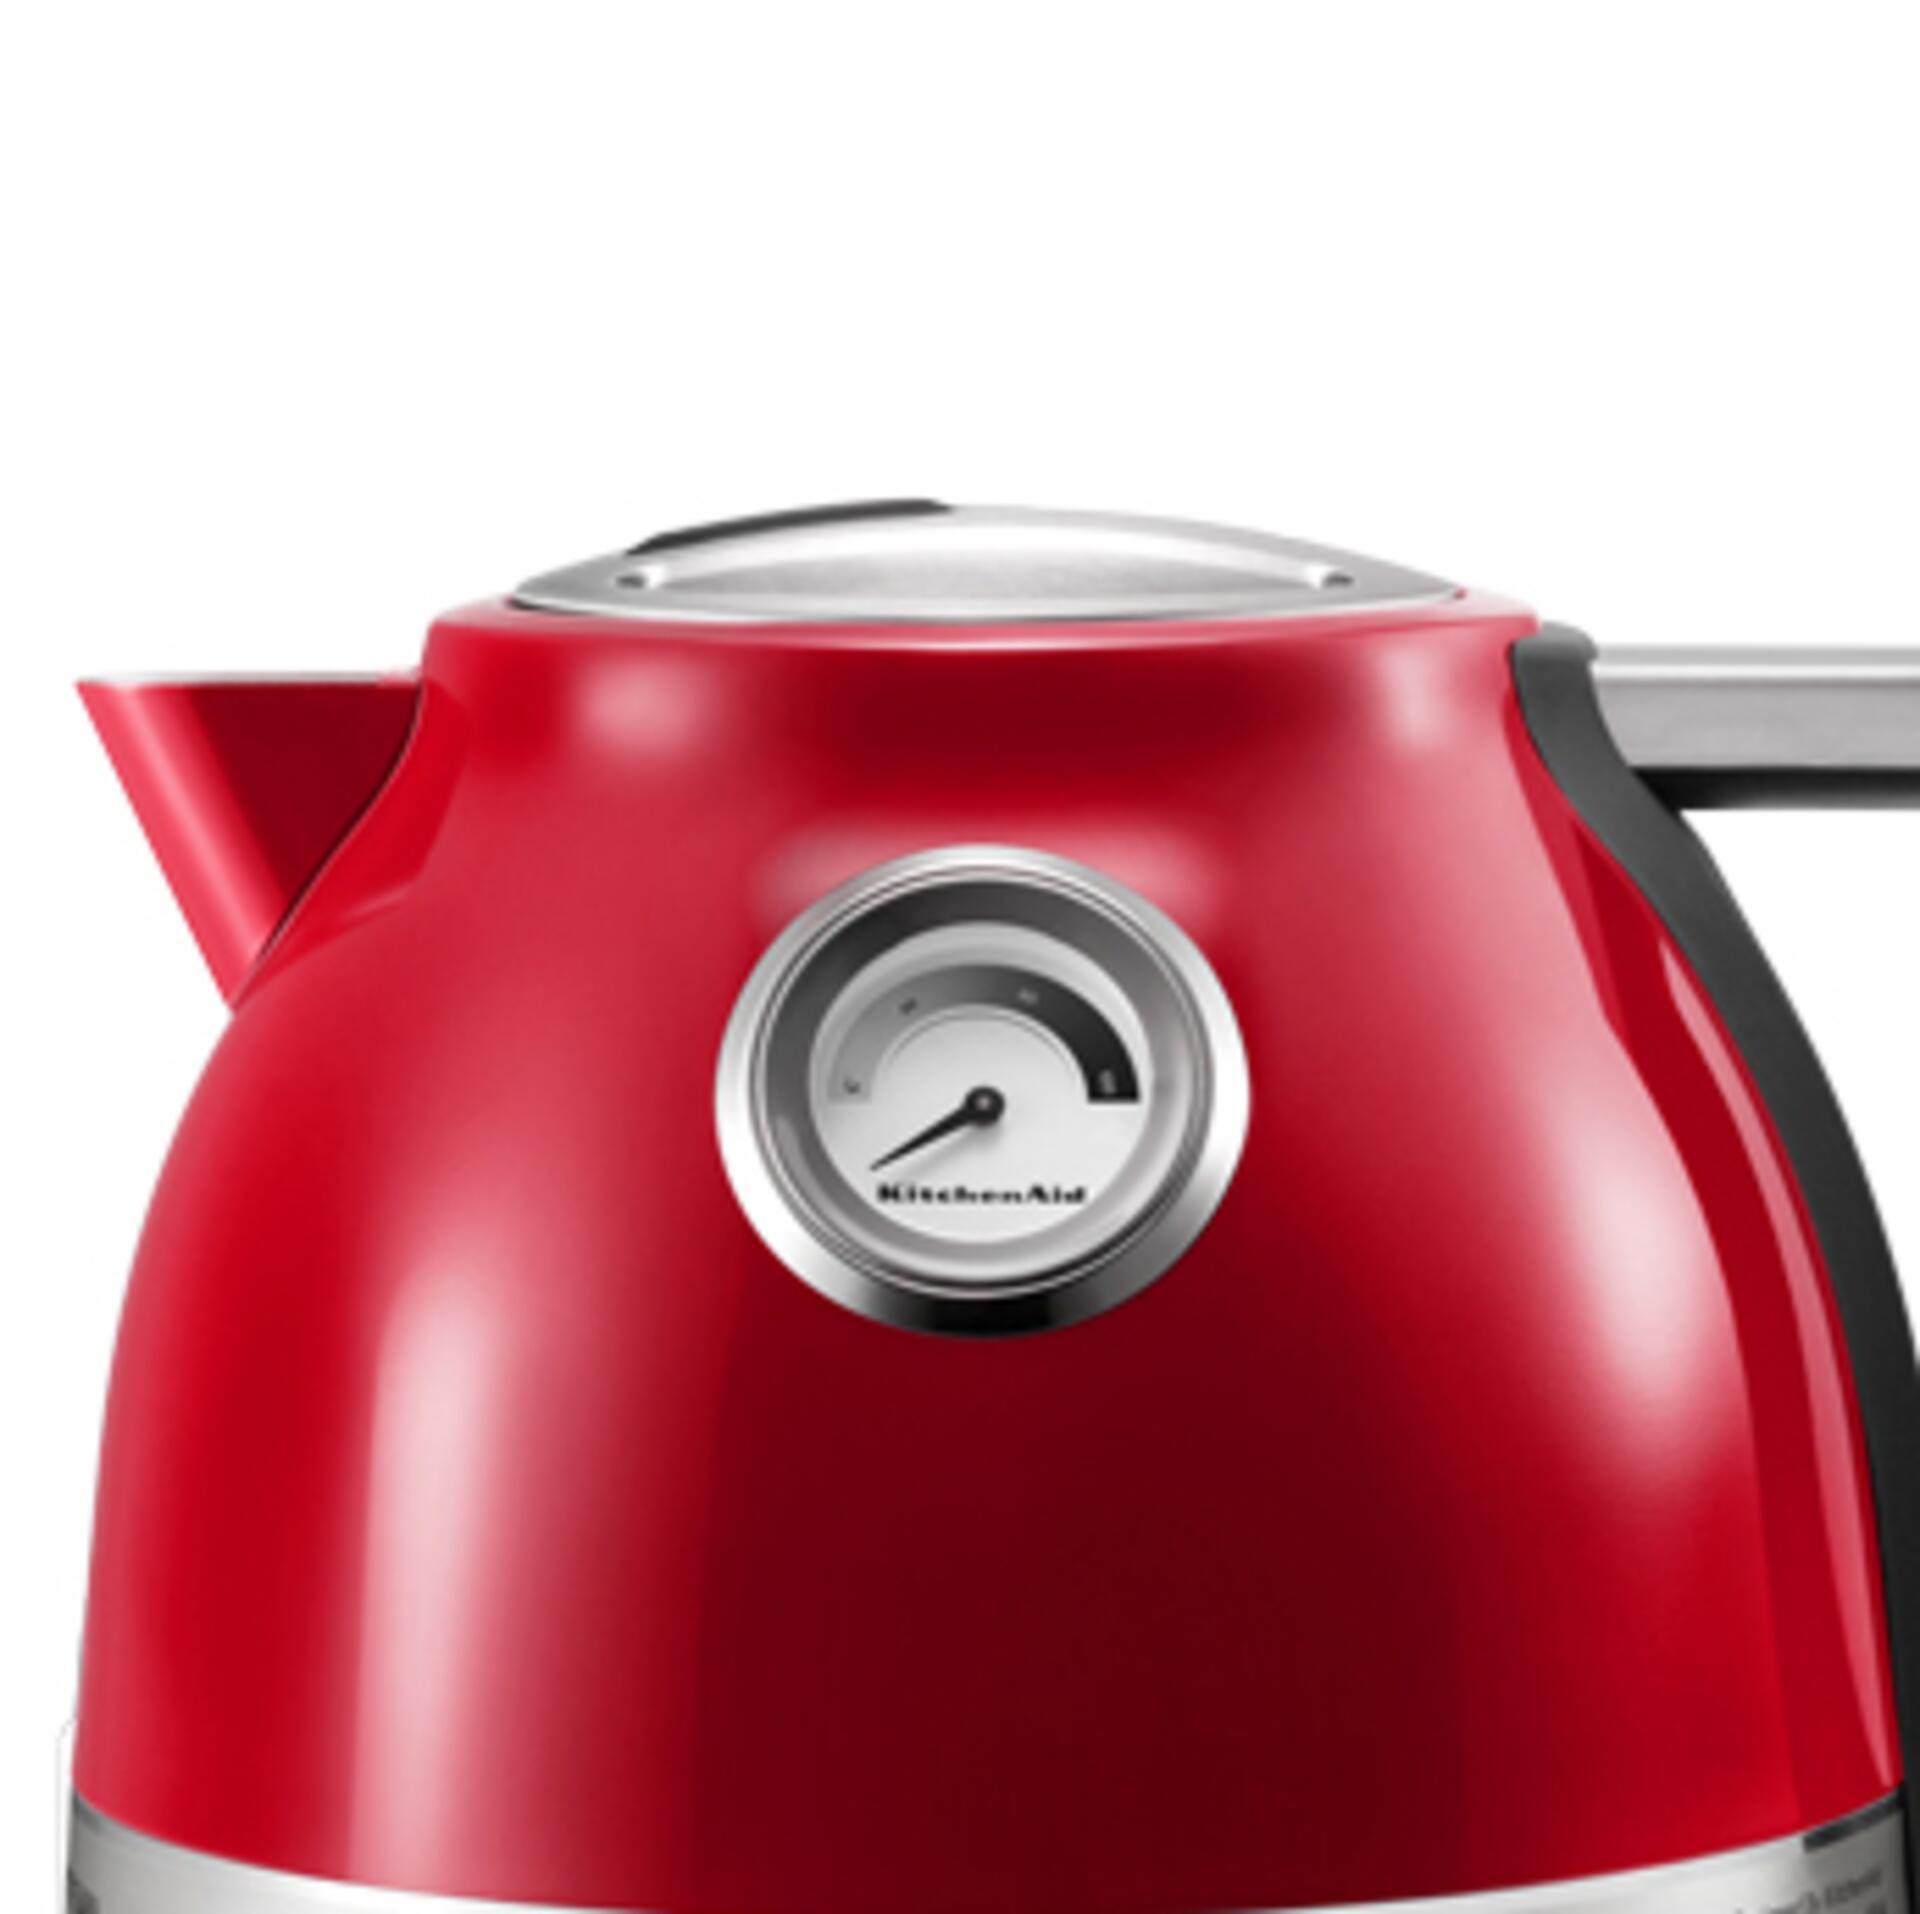 Kitchenaid Artisan Wasserkocher Liebesapfel Rot 5KEK1522ECA